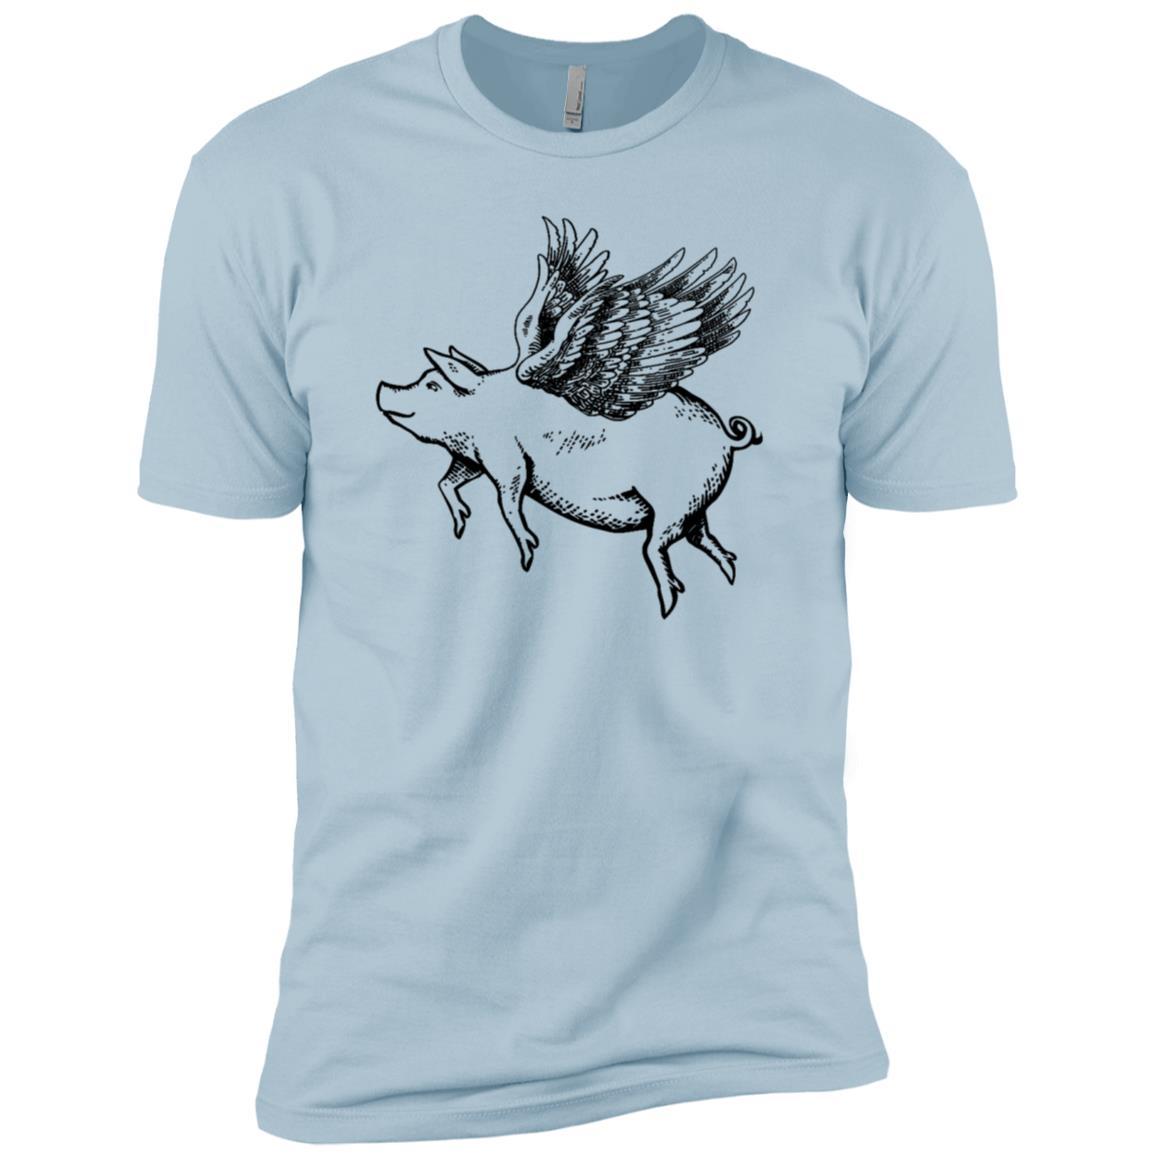 Funny Magical Flying Pig Drawing Men Short Sleeve T-Shirt